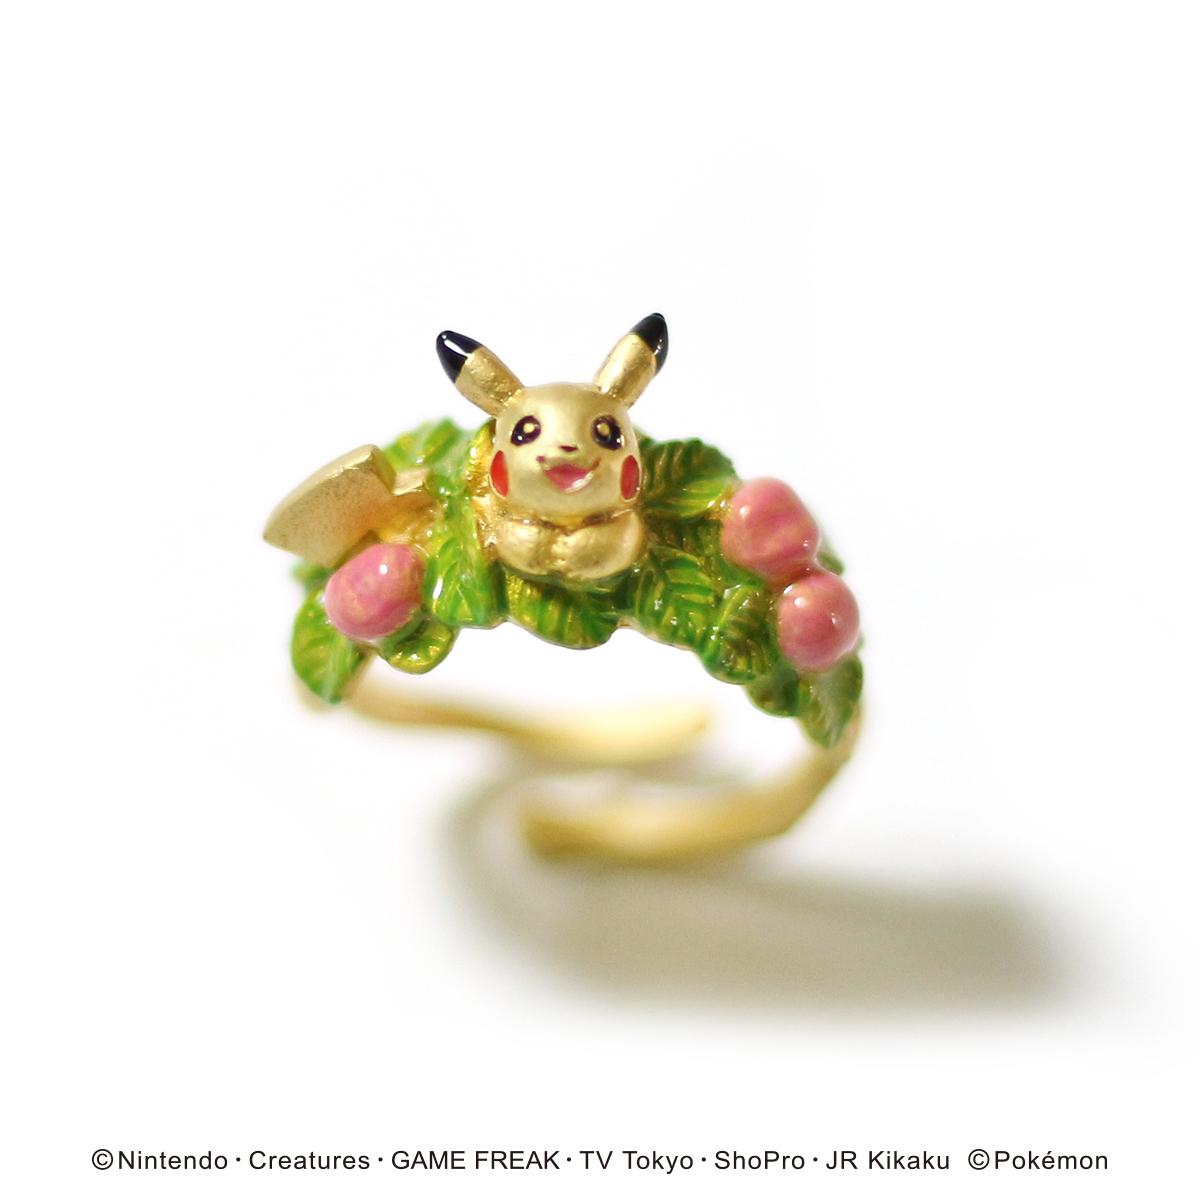 【SUMMER SALE】ピカチュウお花畑リング / リング【ポケモン第3弾】(フリーサイズ)